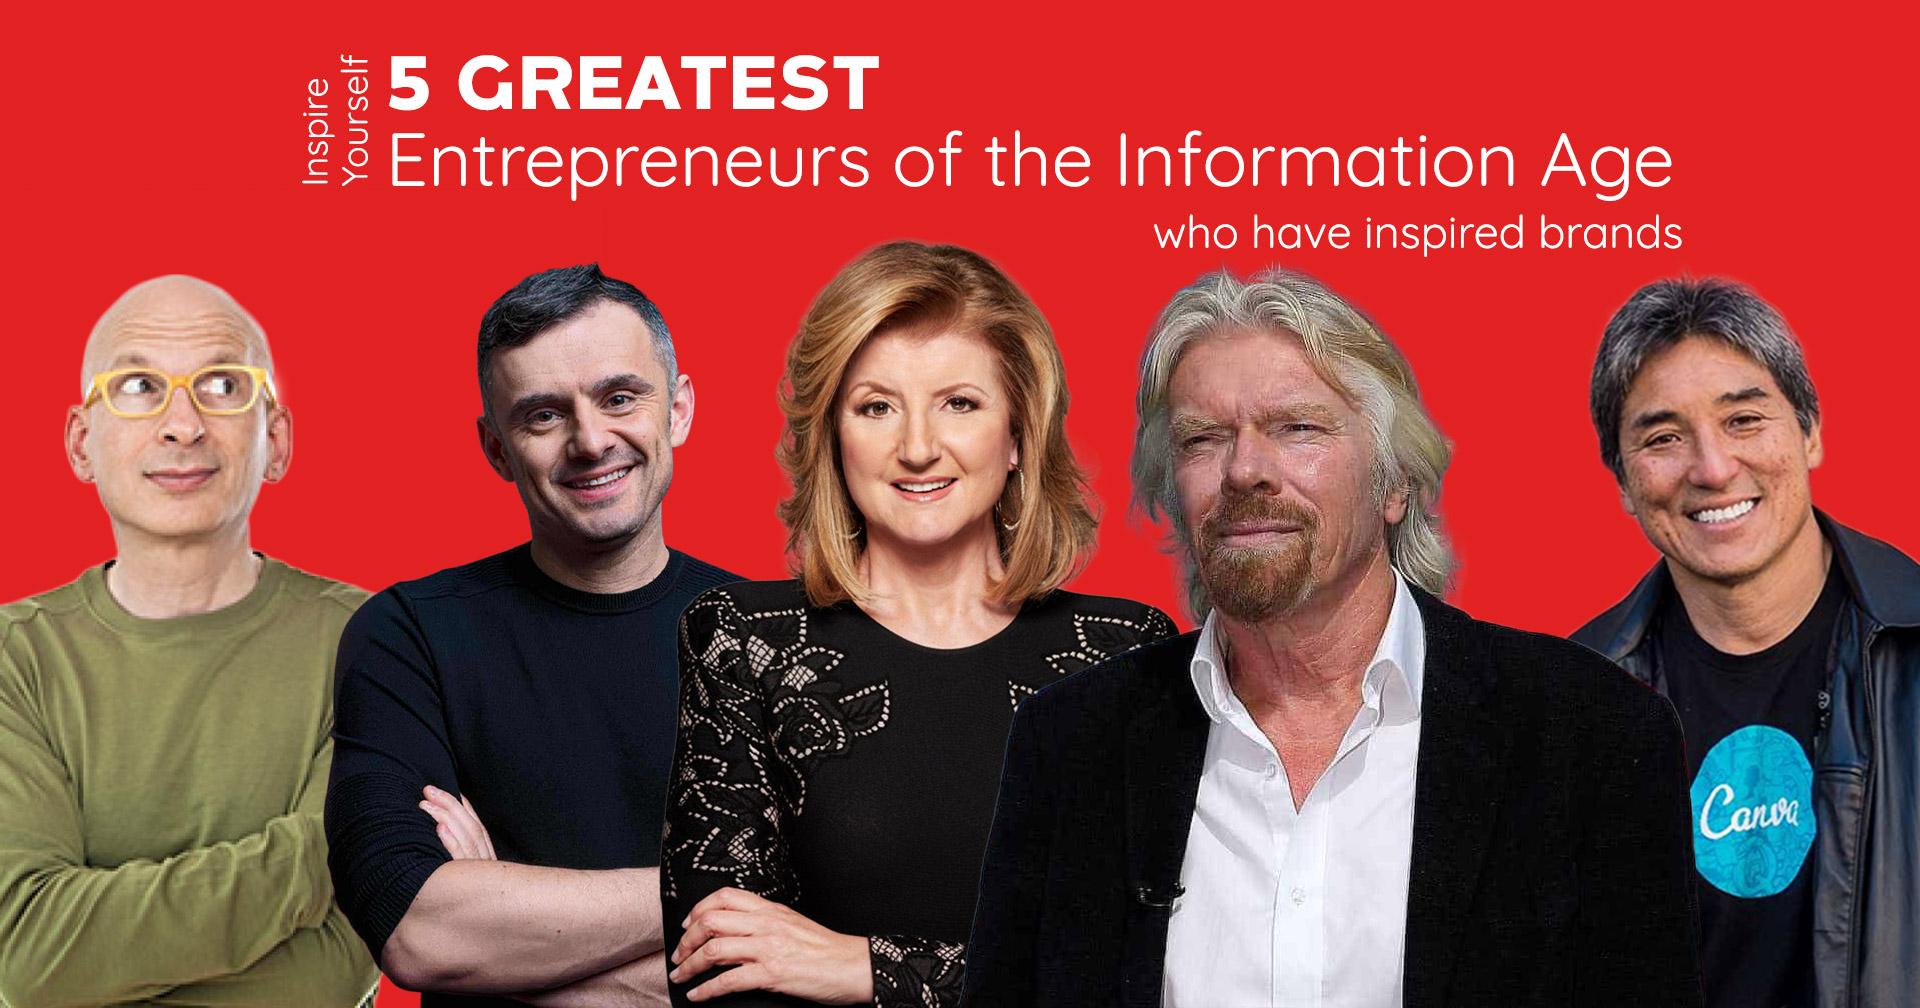 5 Greatest Entrepreneurs Who Have Inspired Brands